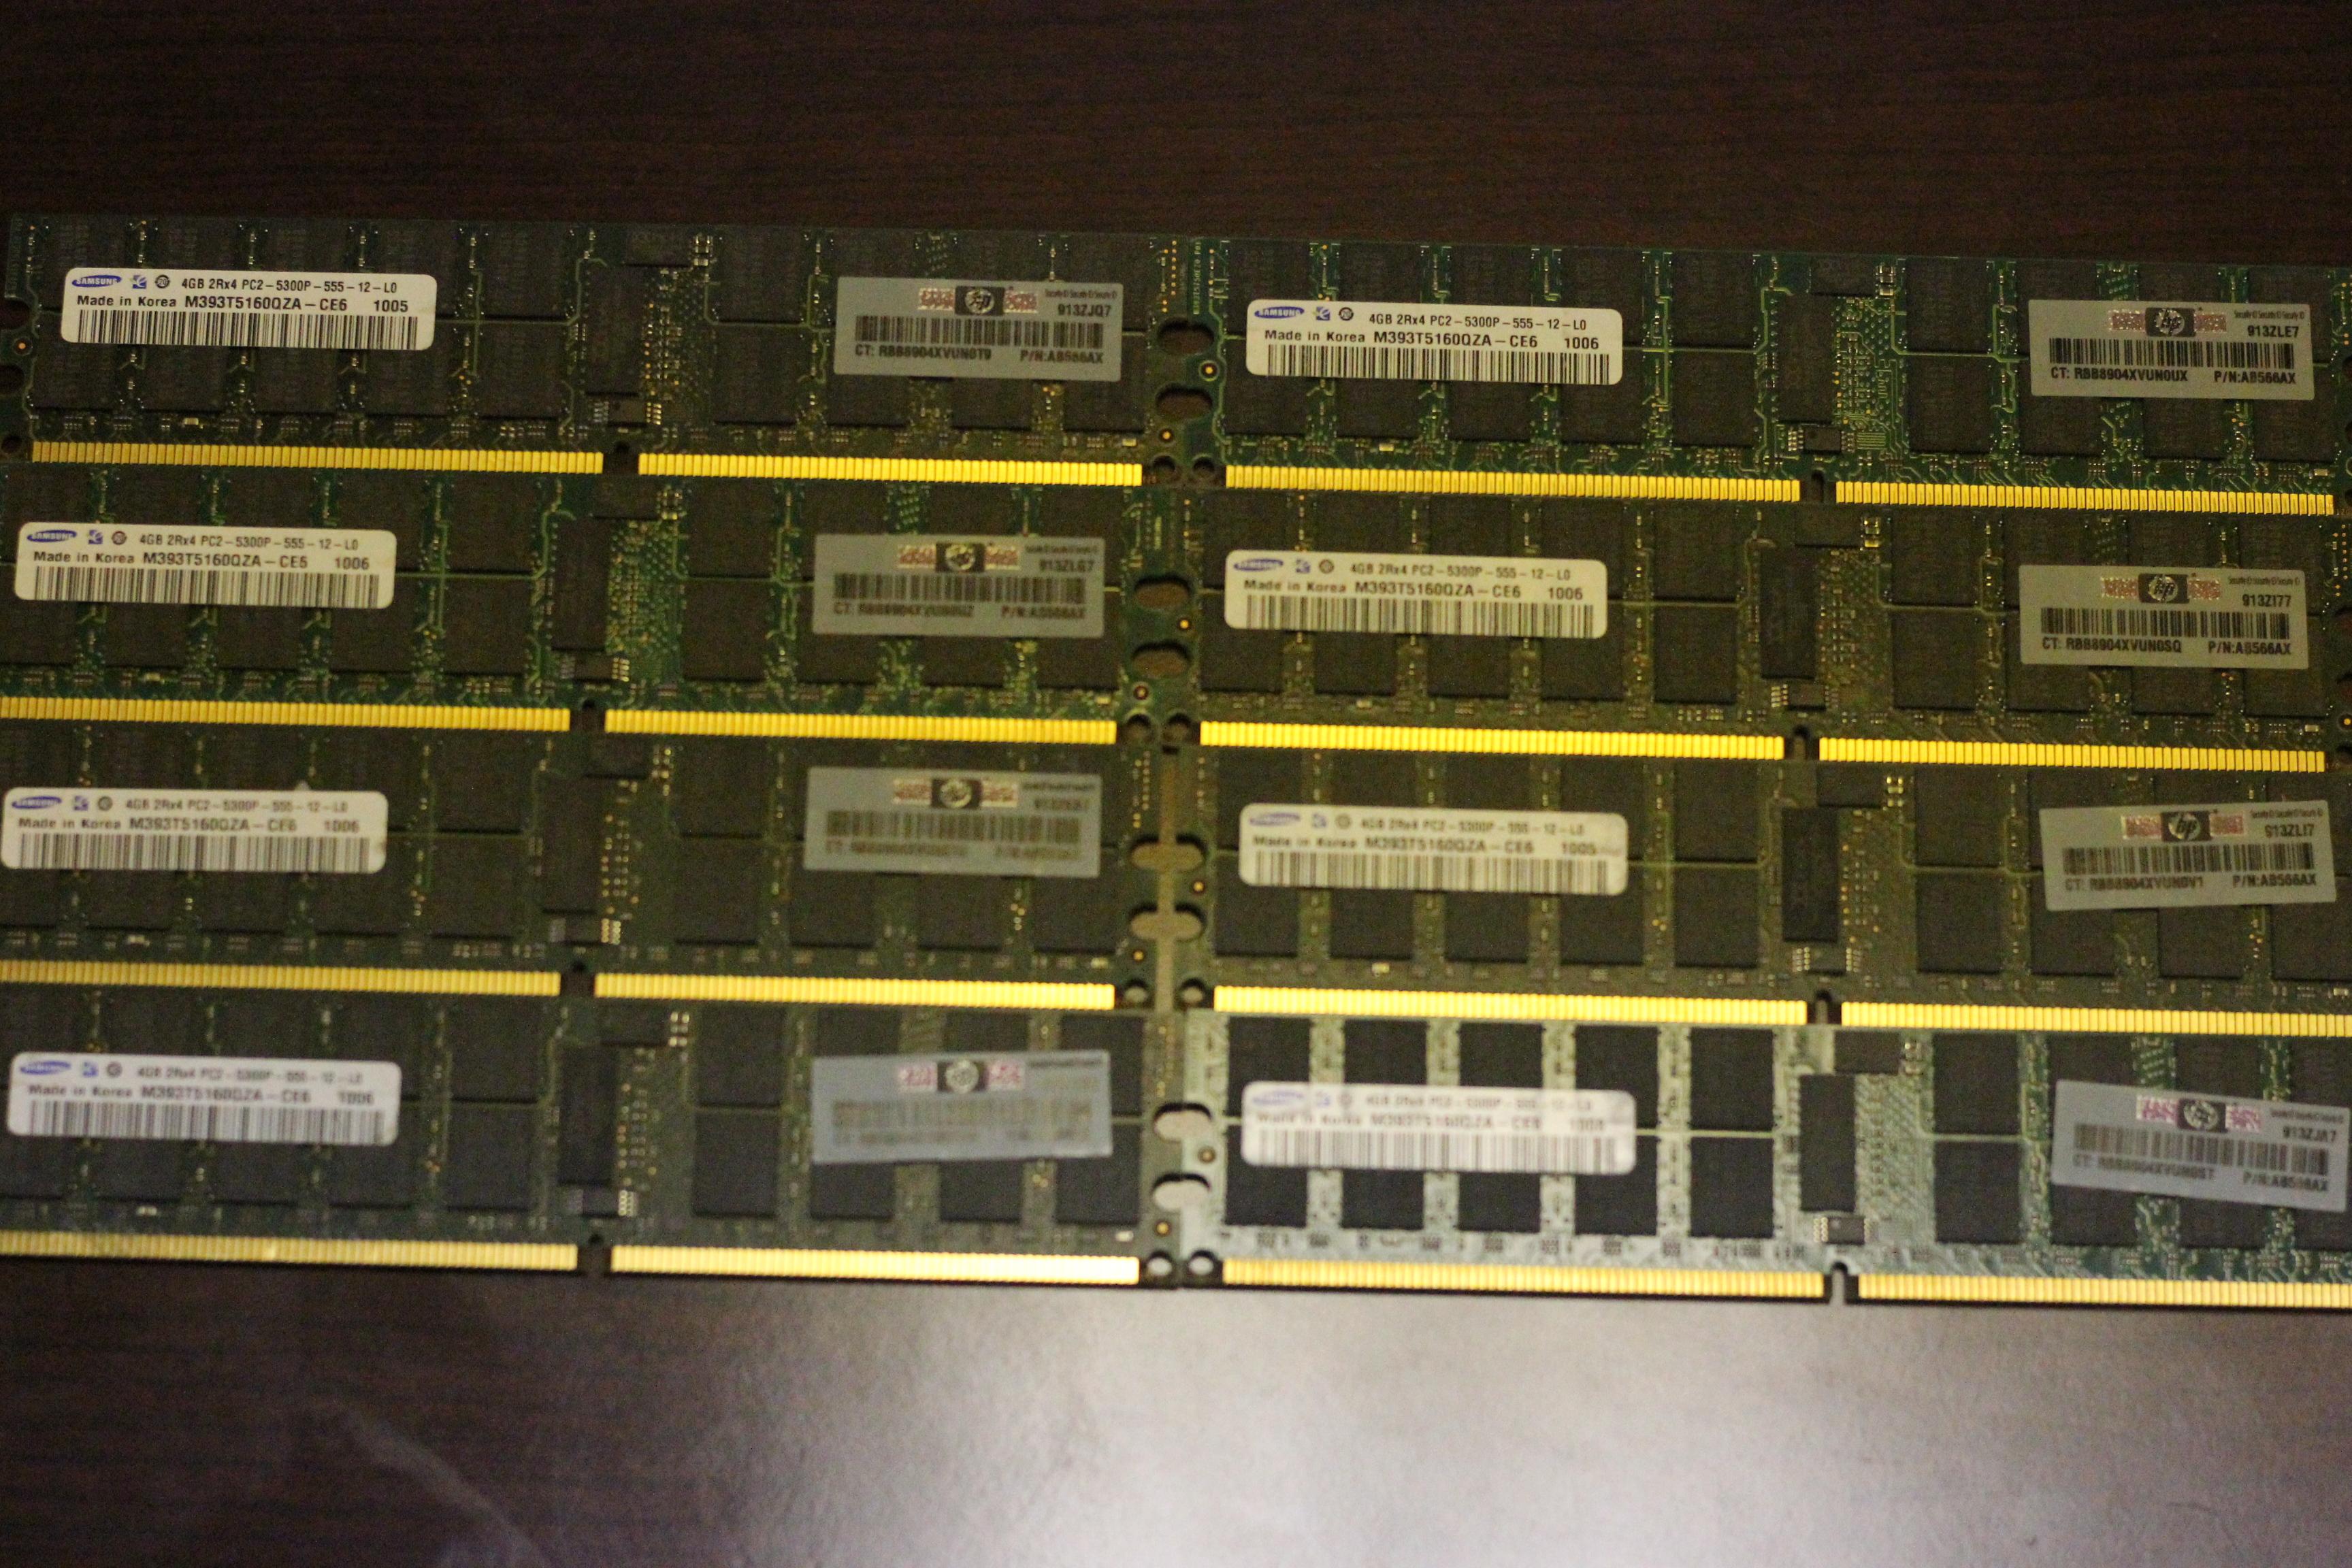 Server Ram 32gb 8x 4gb Pc2 5300p Ecc Reg Ddr2 667 Pc5300